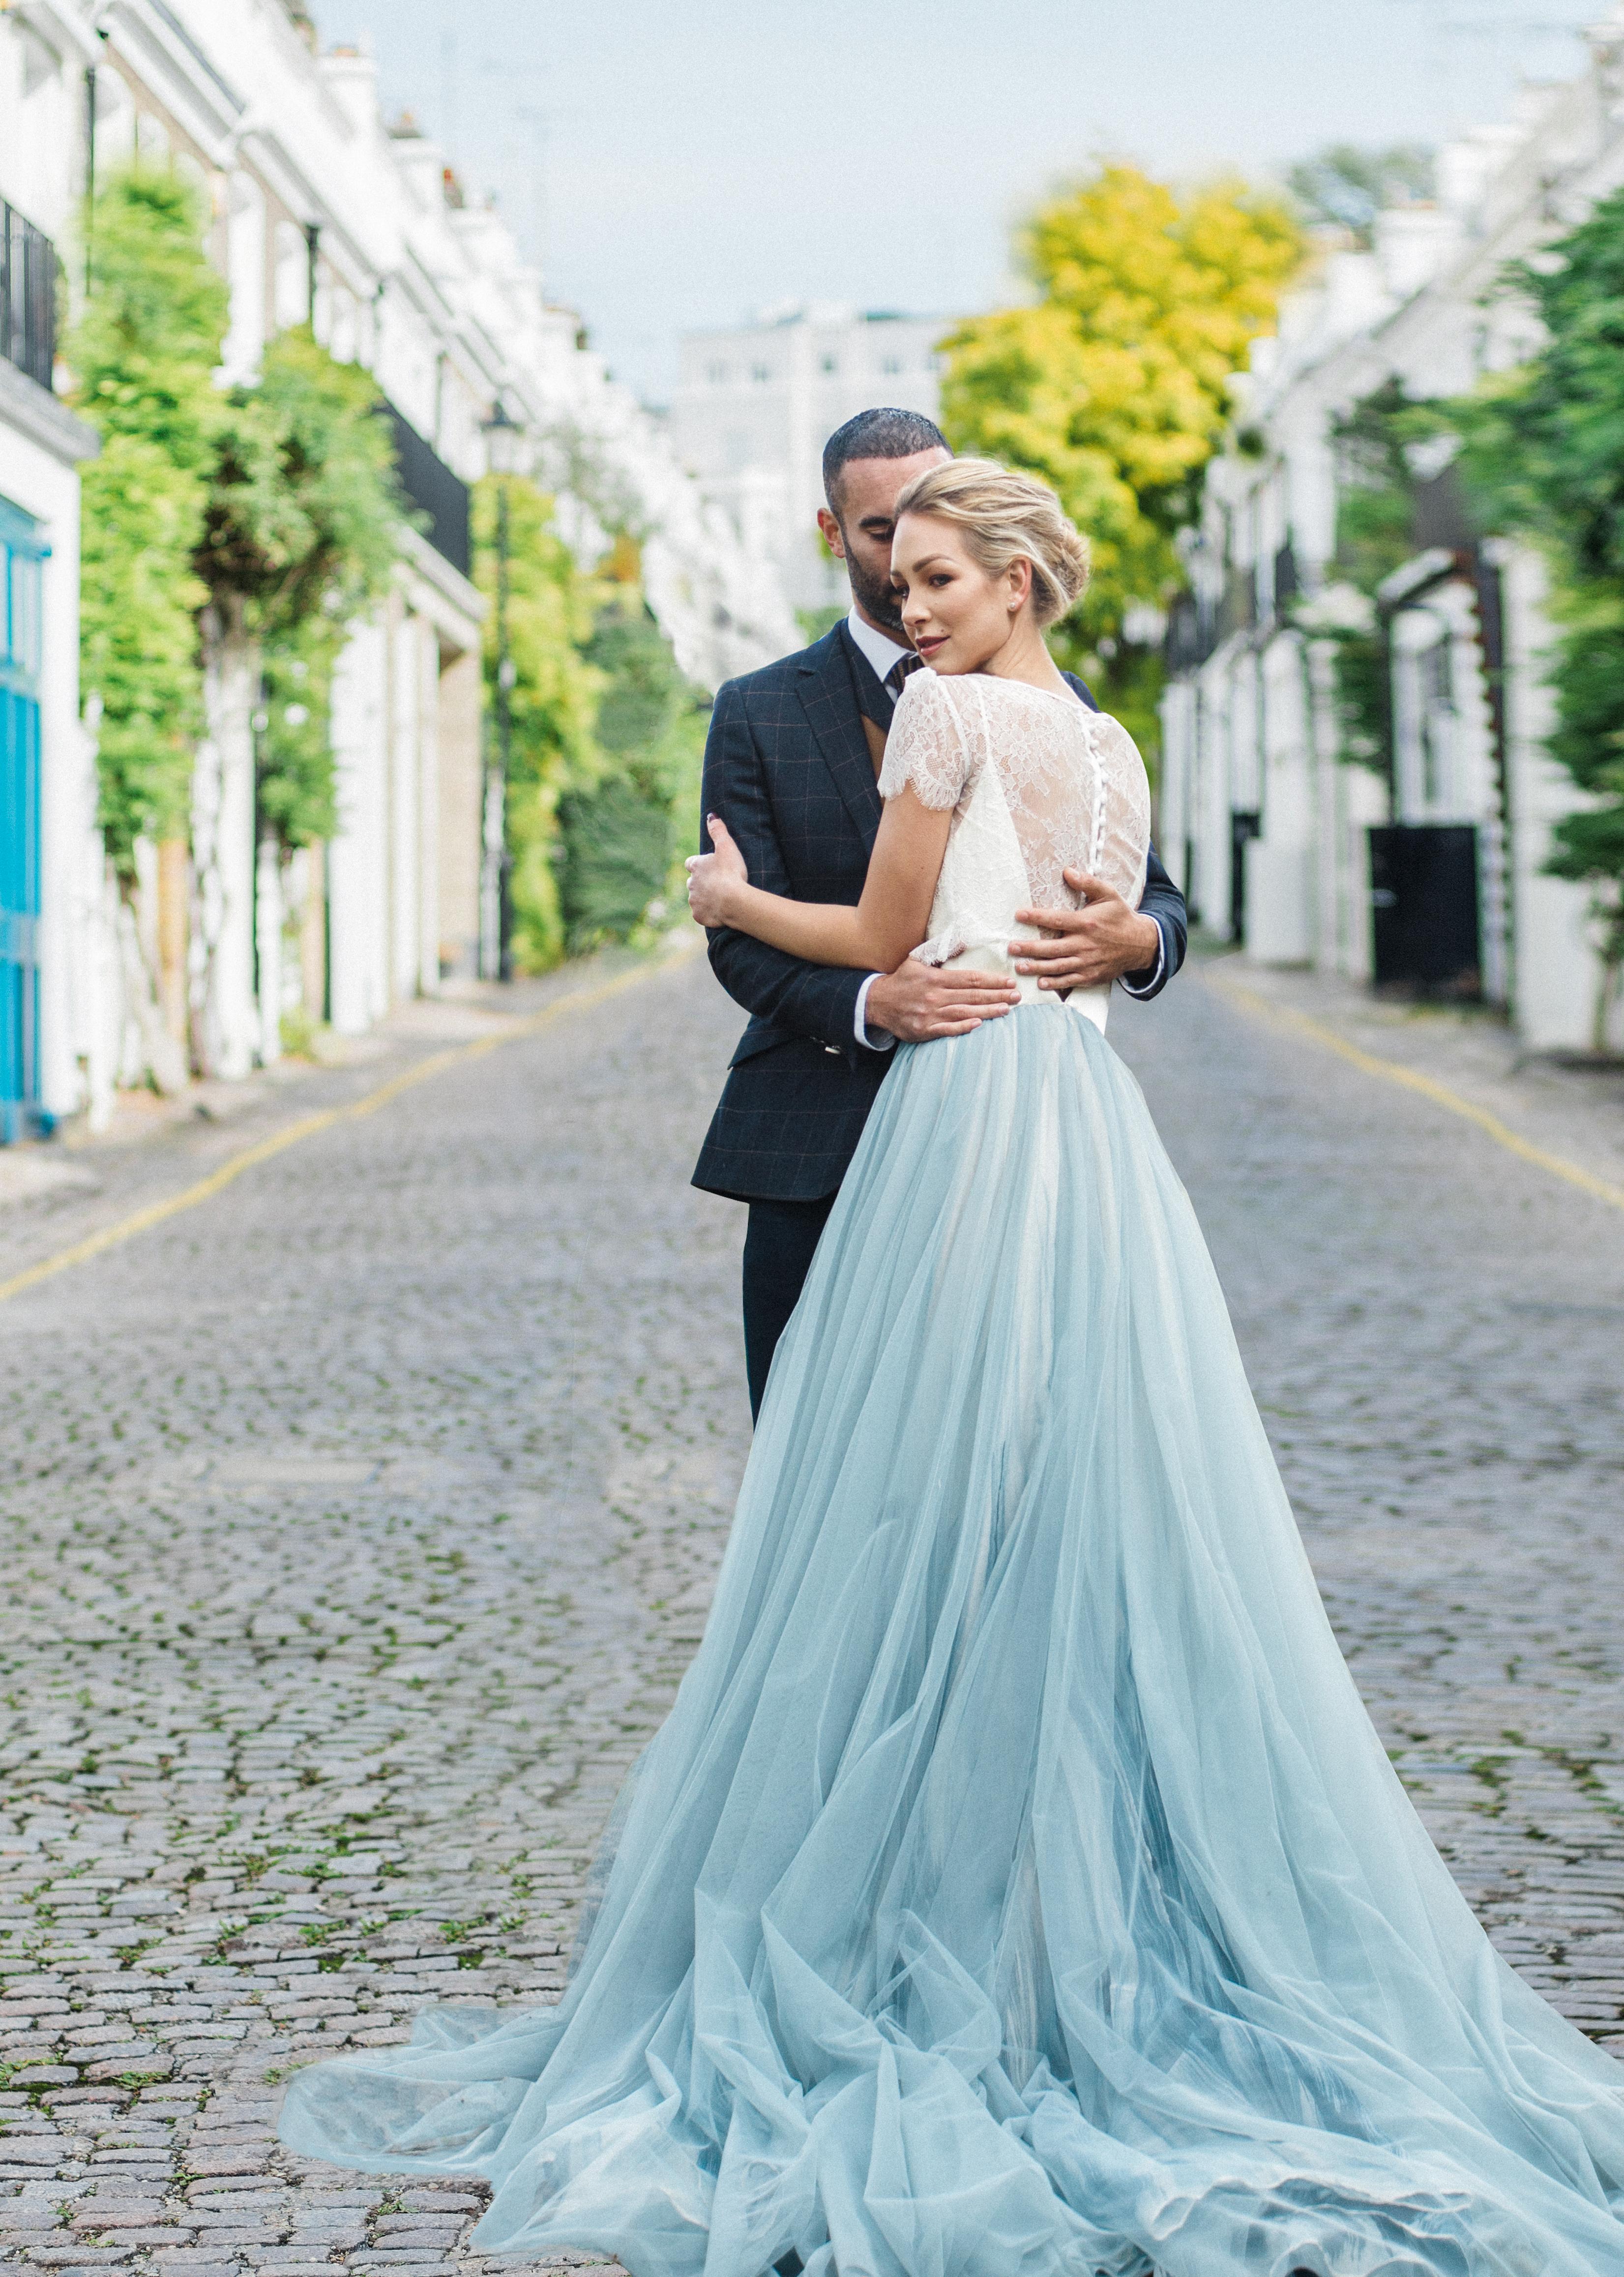 Urban Photo Lab | Wedding Photographers in Manchester | UK